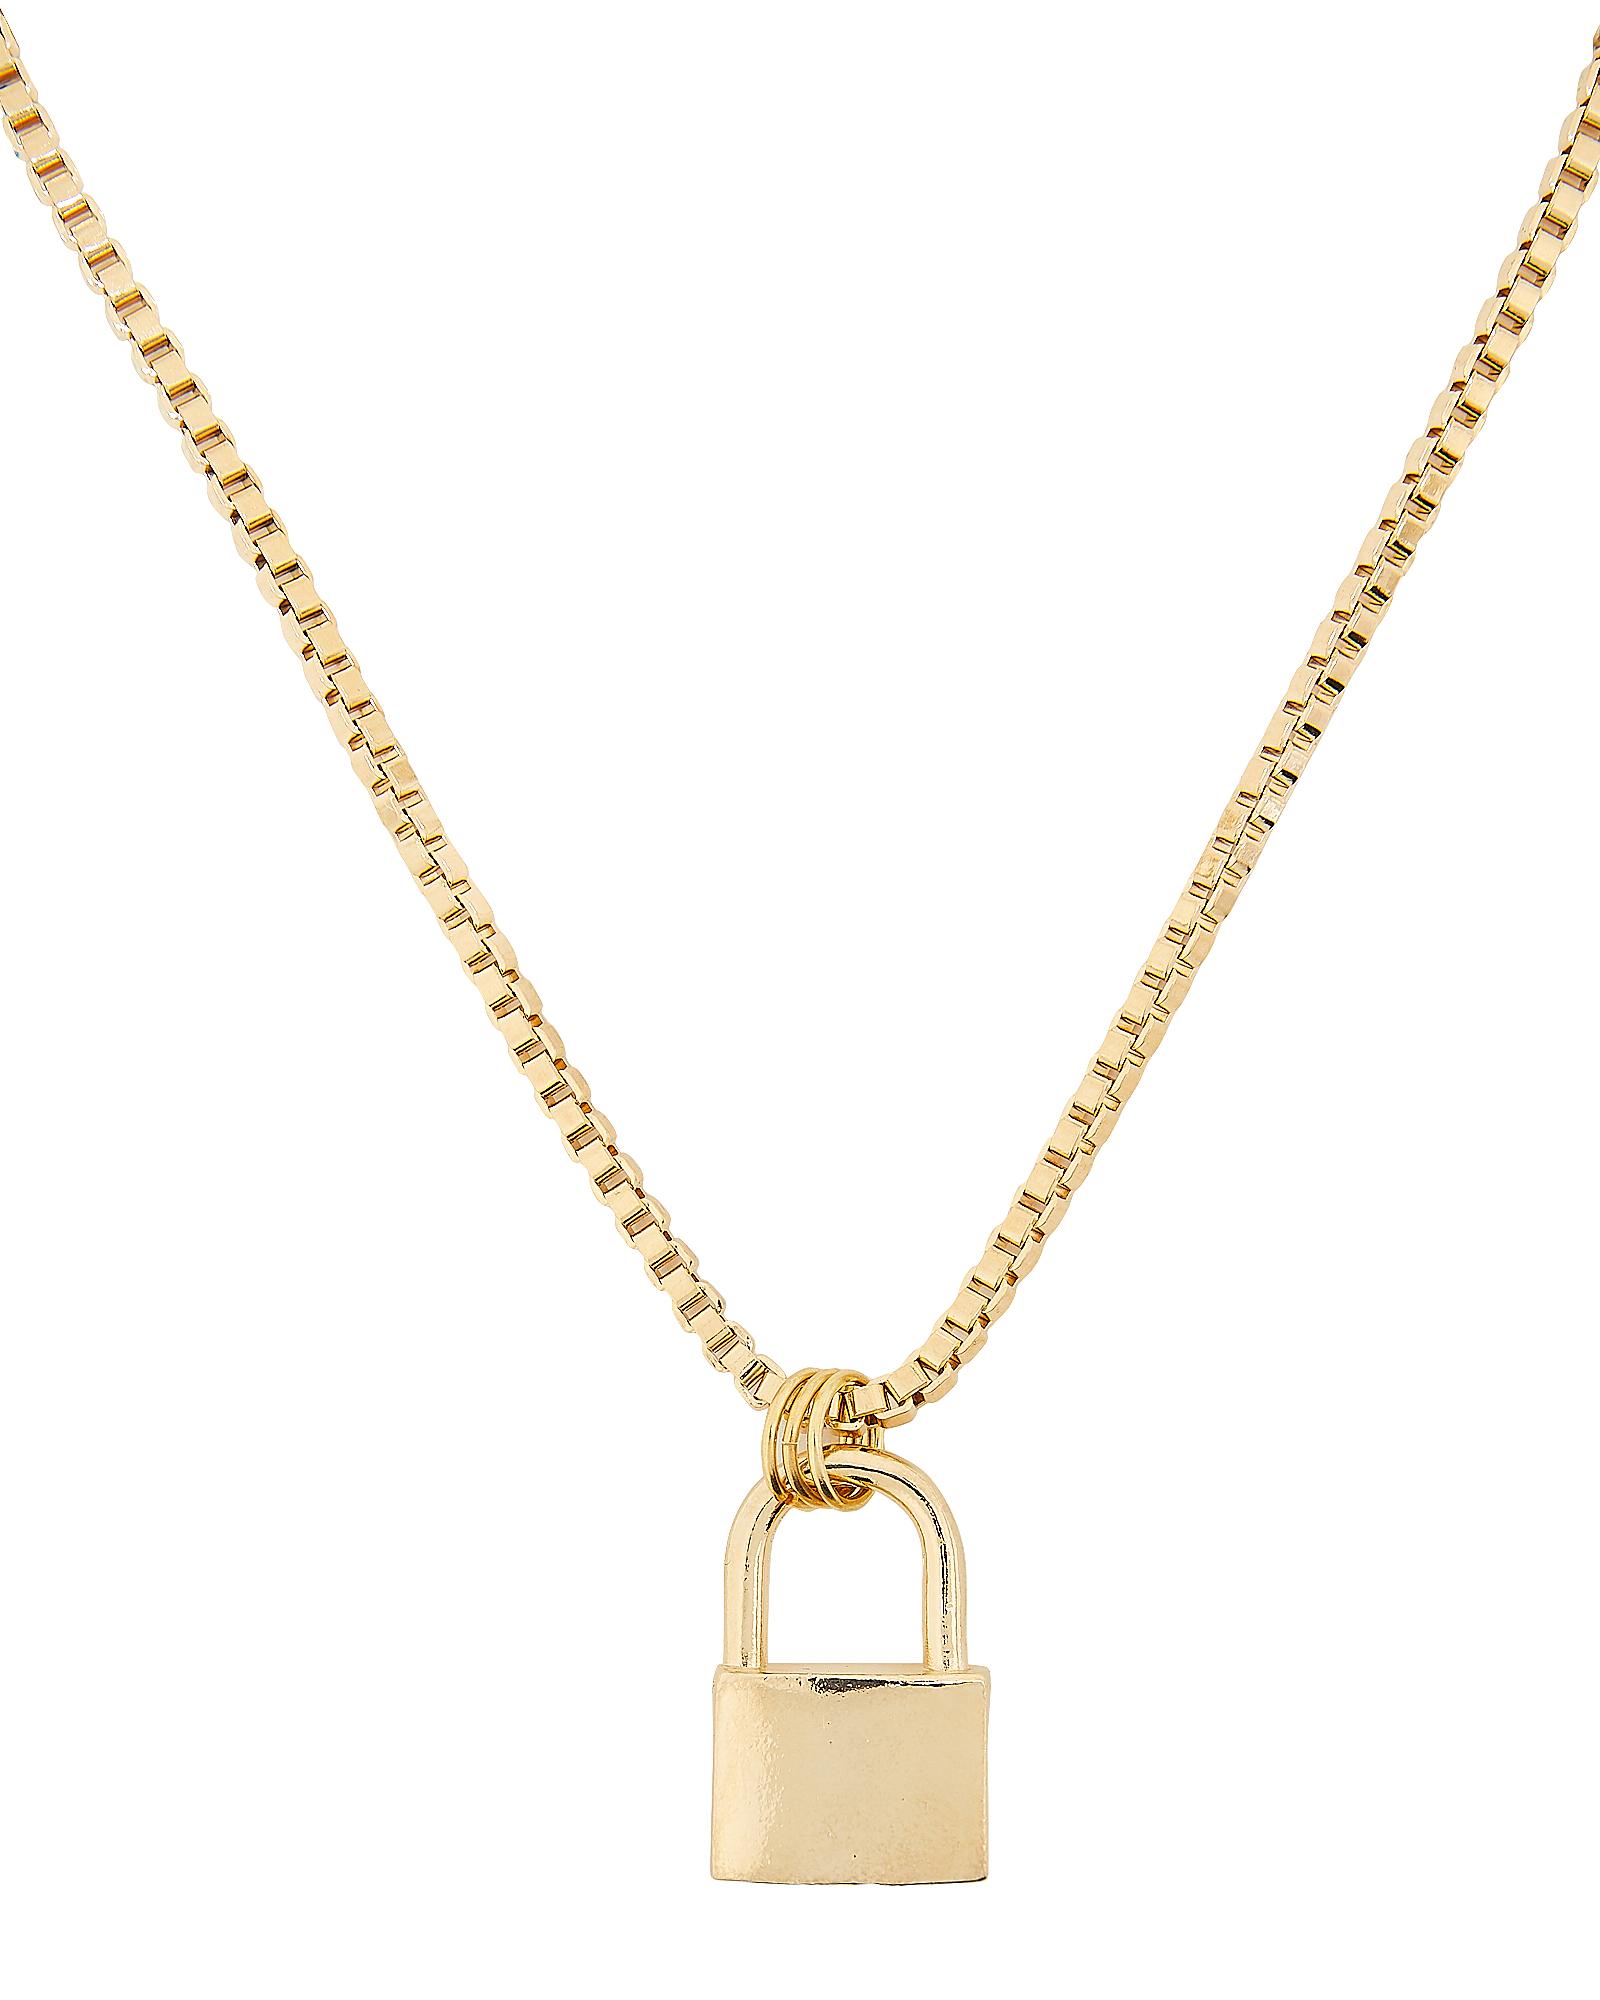 LARUICCI Padlock Long Necklace